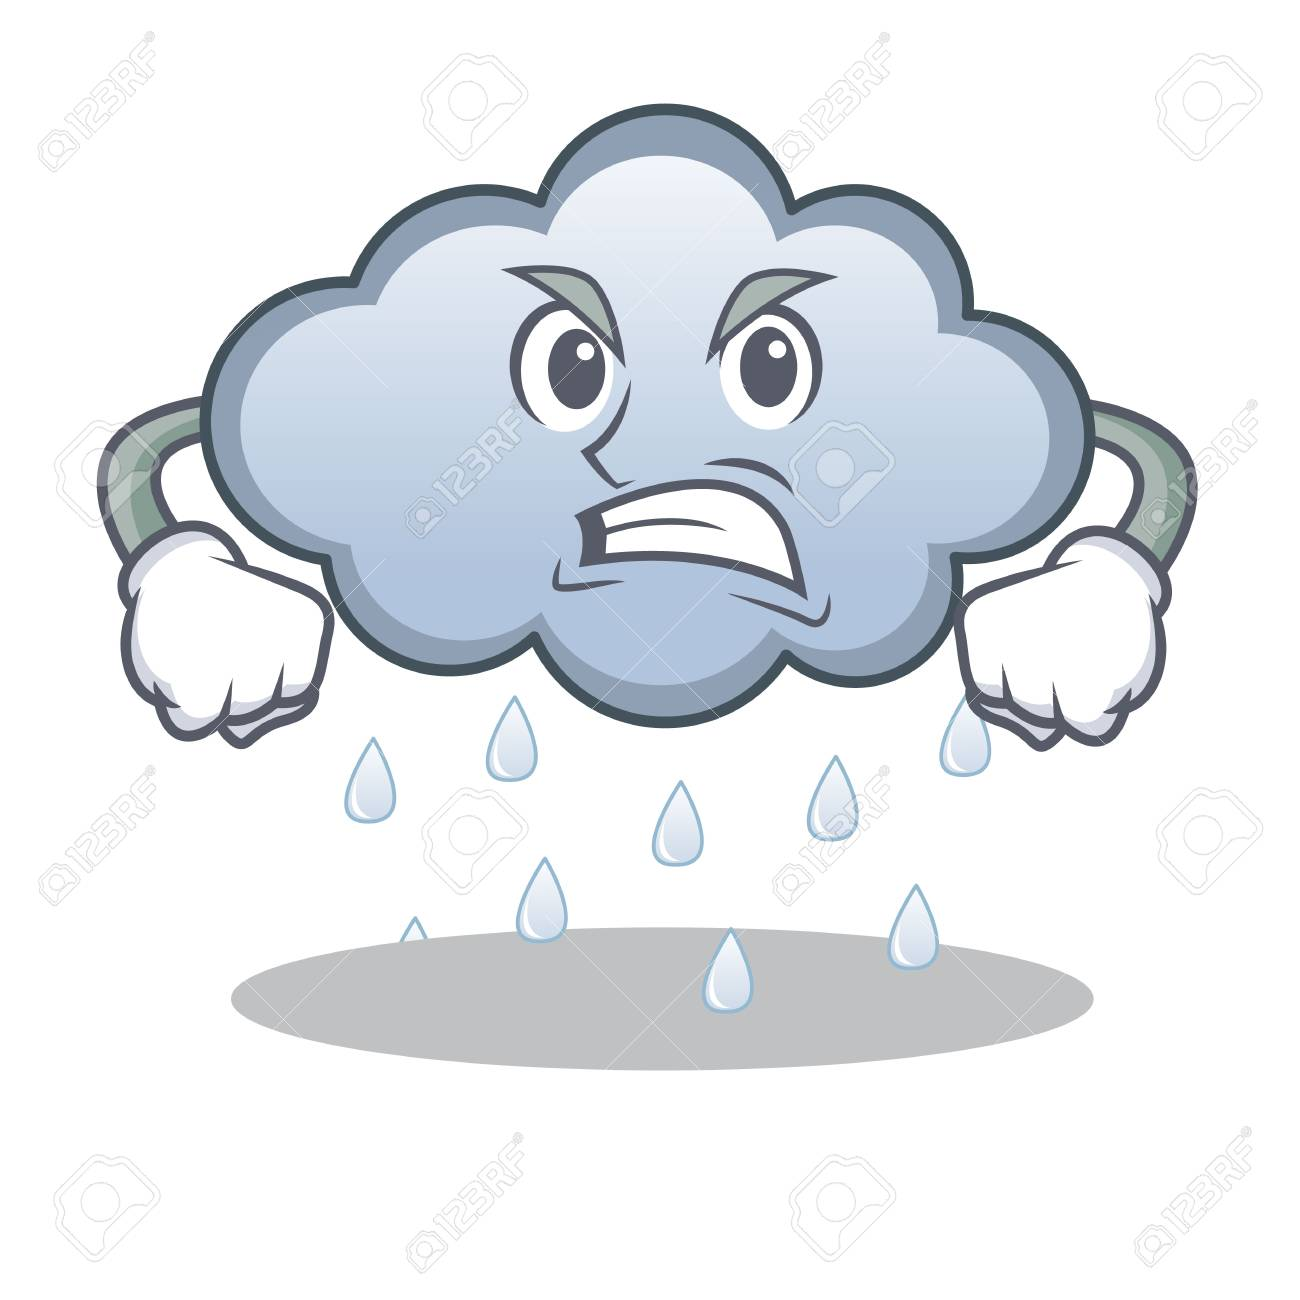 angry rain cloud character cartoon royalty free cliparts vectors rh 123rf com cartoon character rain cloud over head cartoon rain cloud with lightning